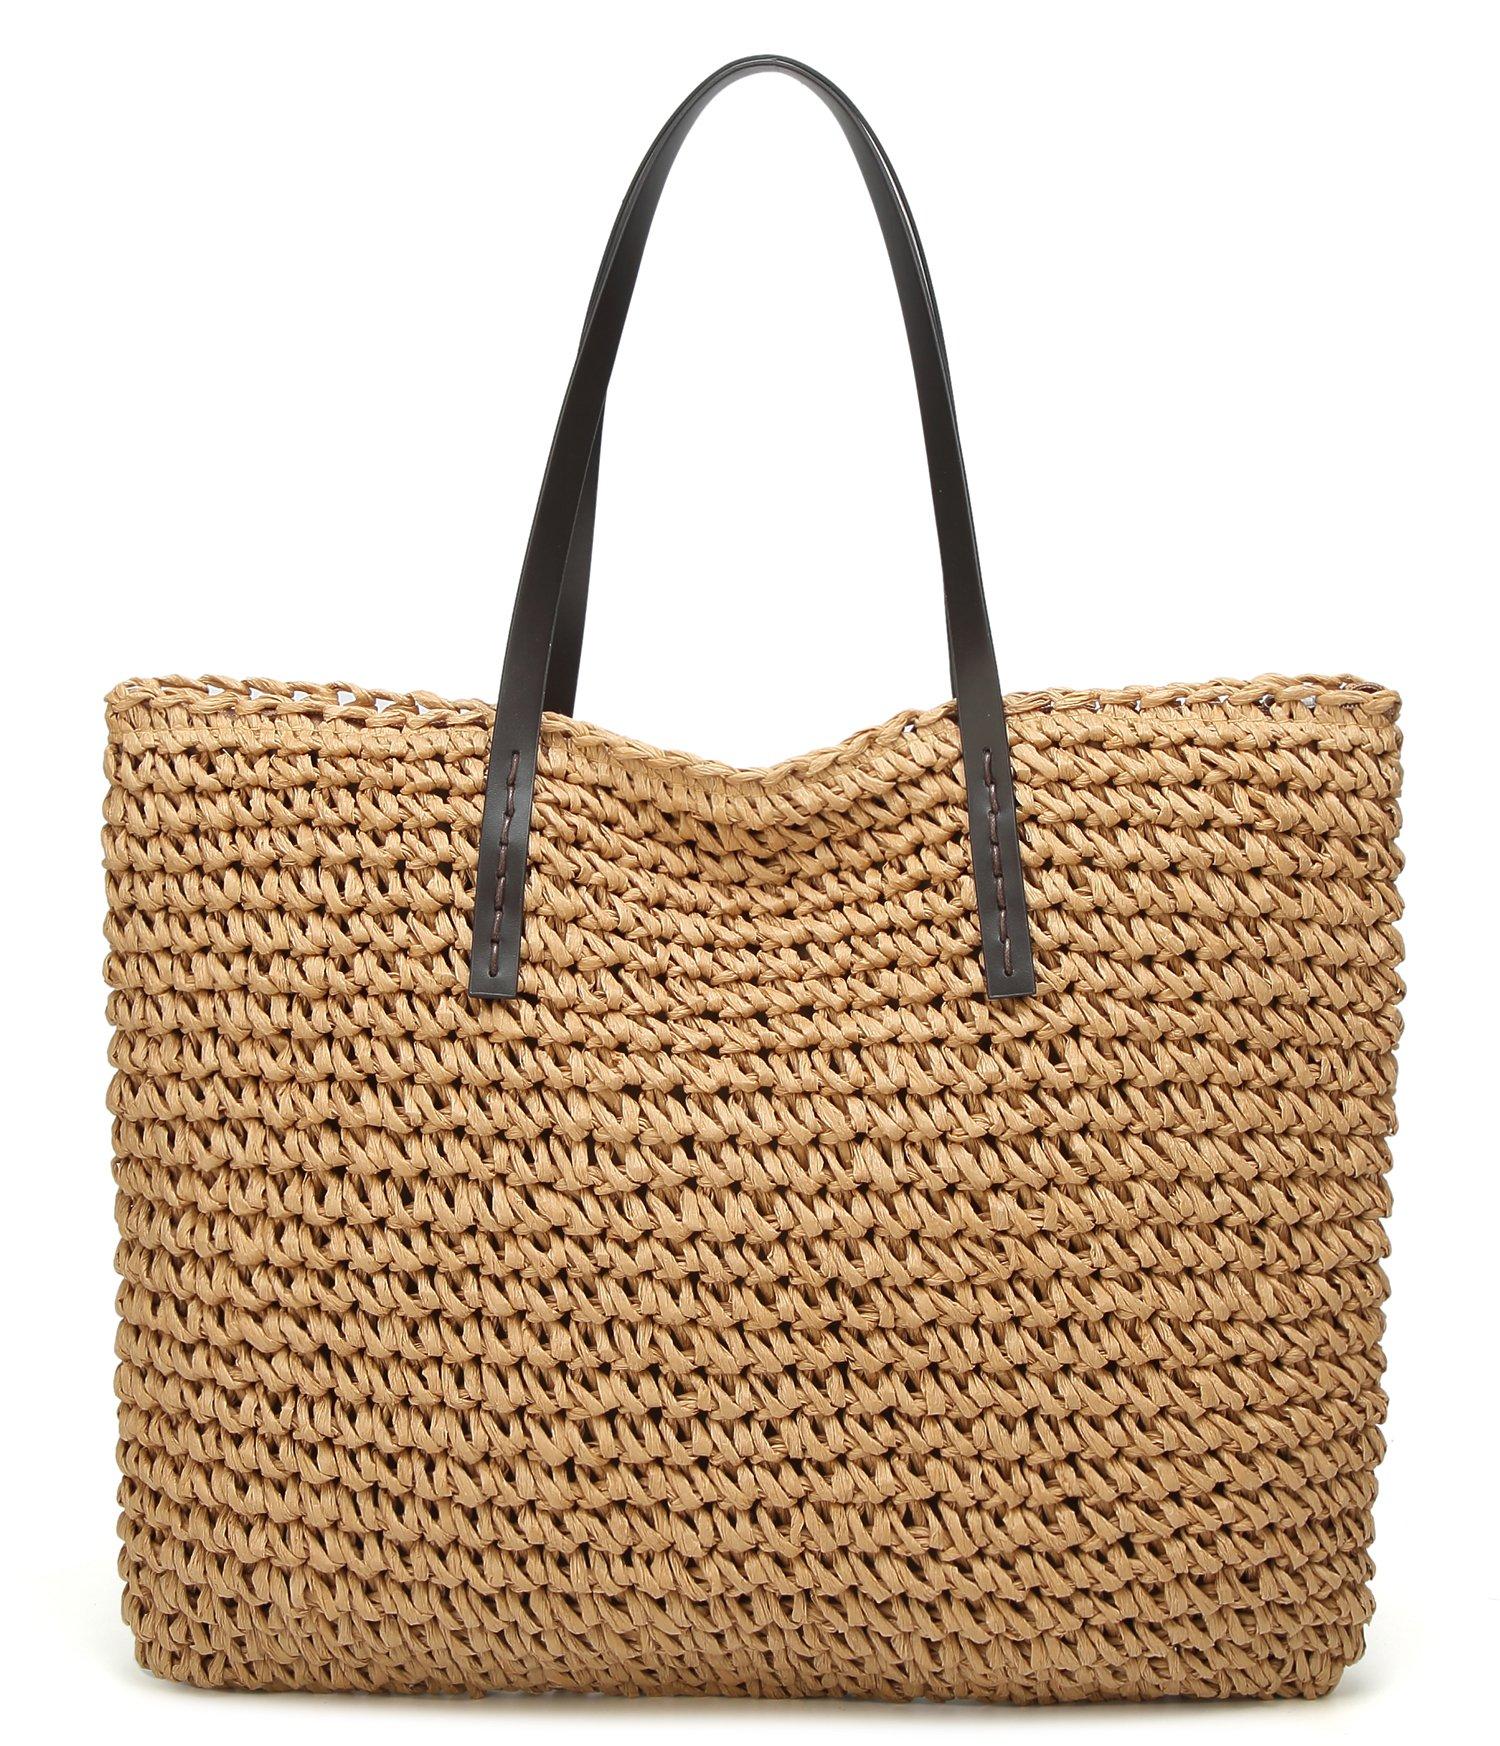 Molodo Summer Straw Handbags Top Handle Crossbody Shoulder Satchels Tote Beach Purse Bags Light-coffee